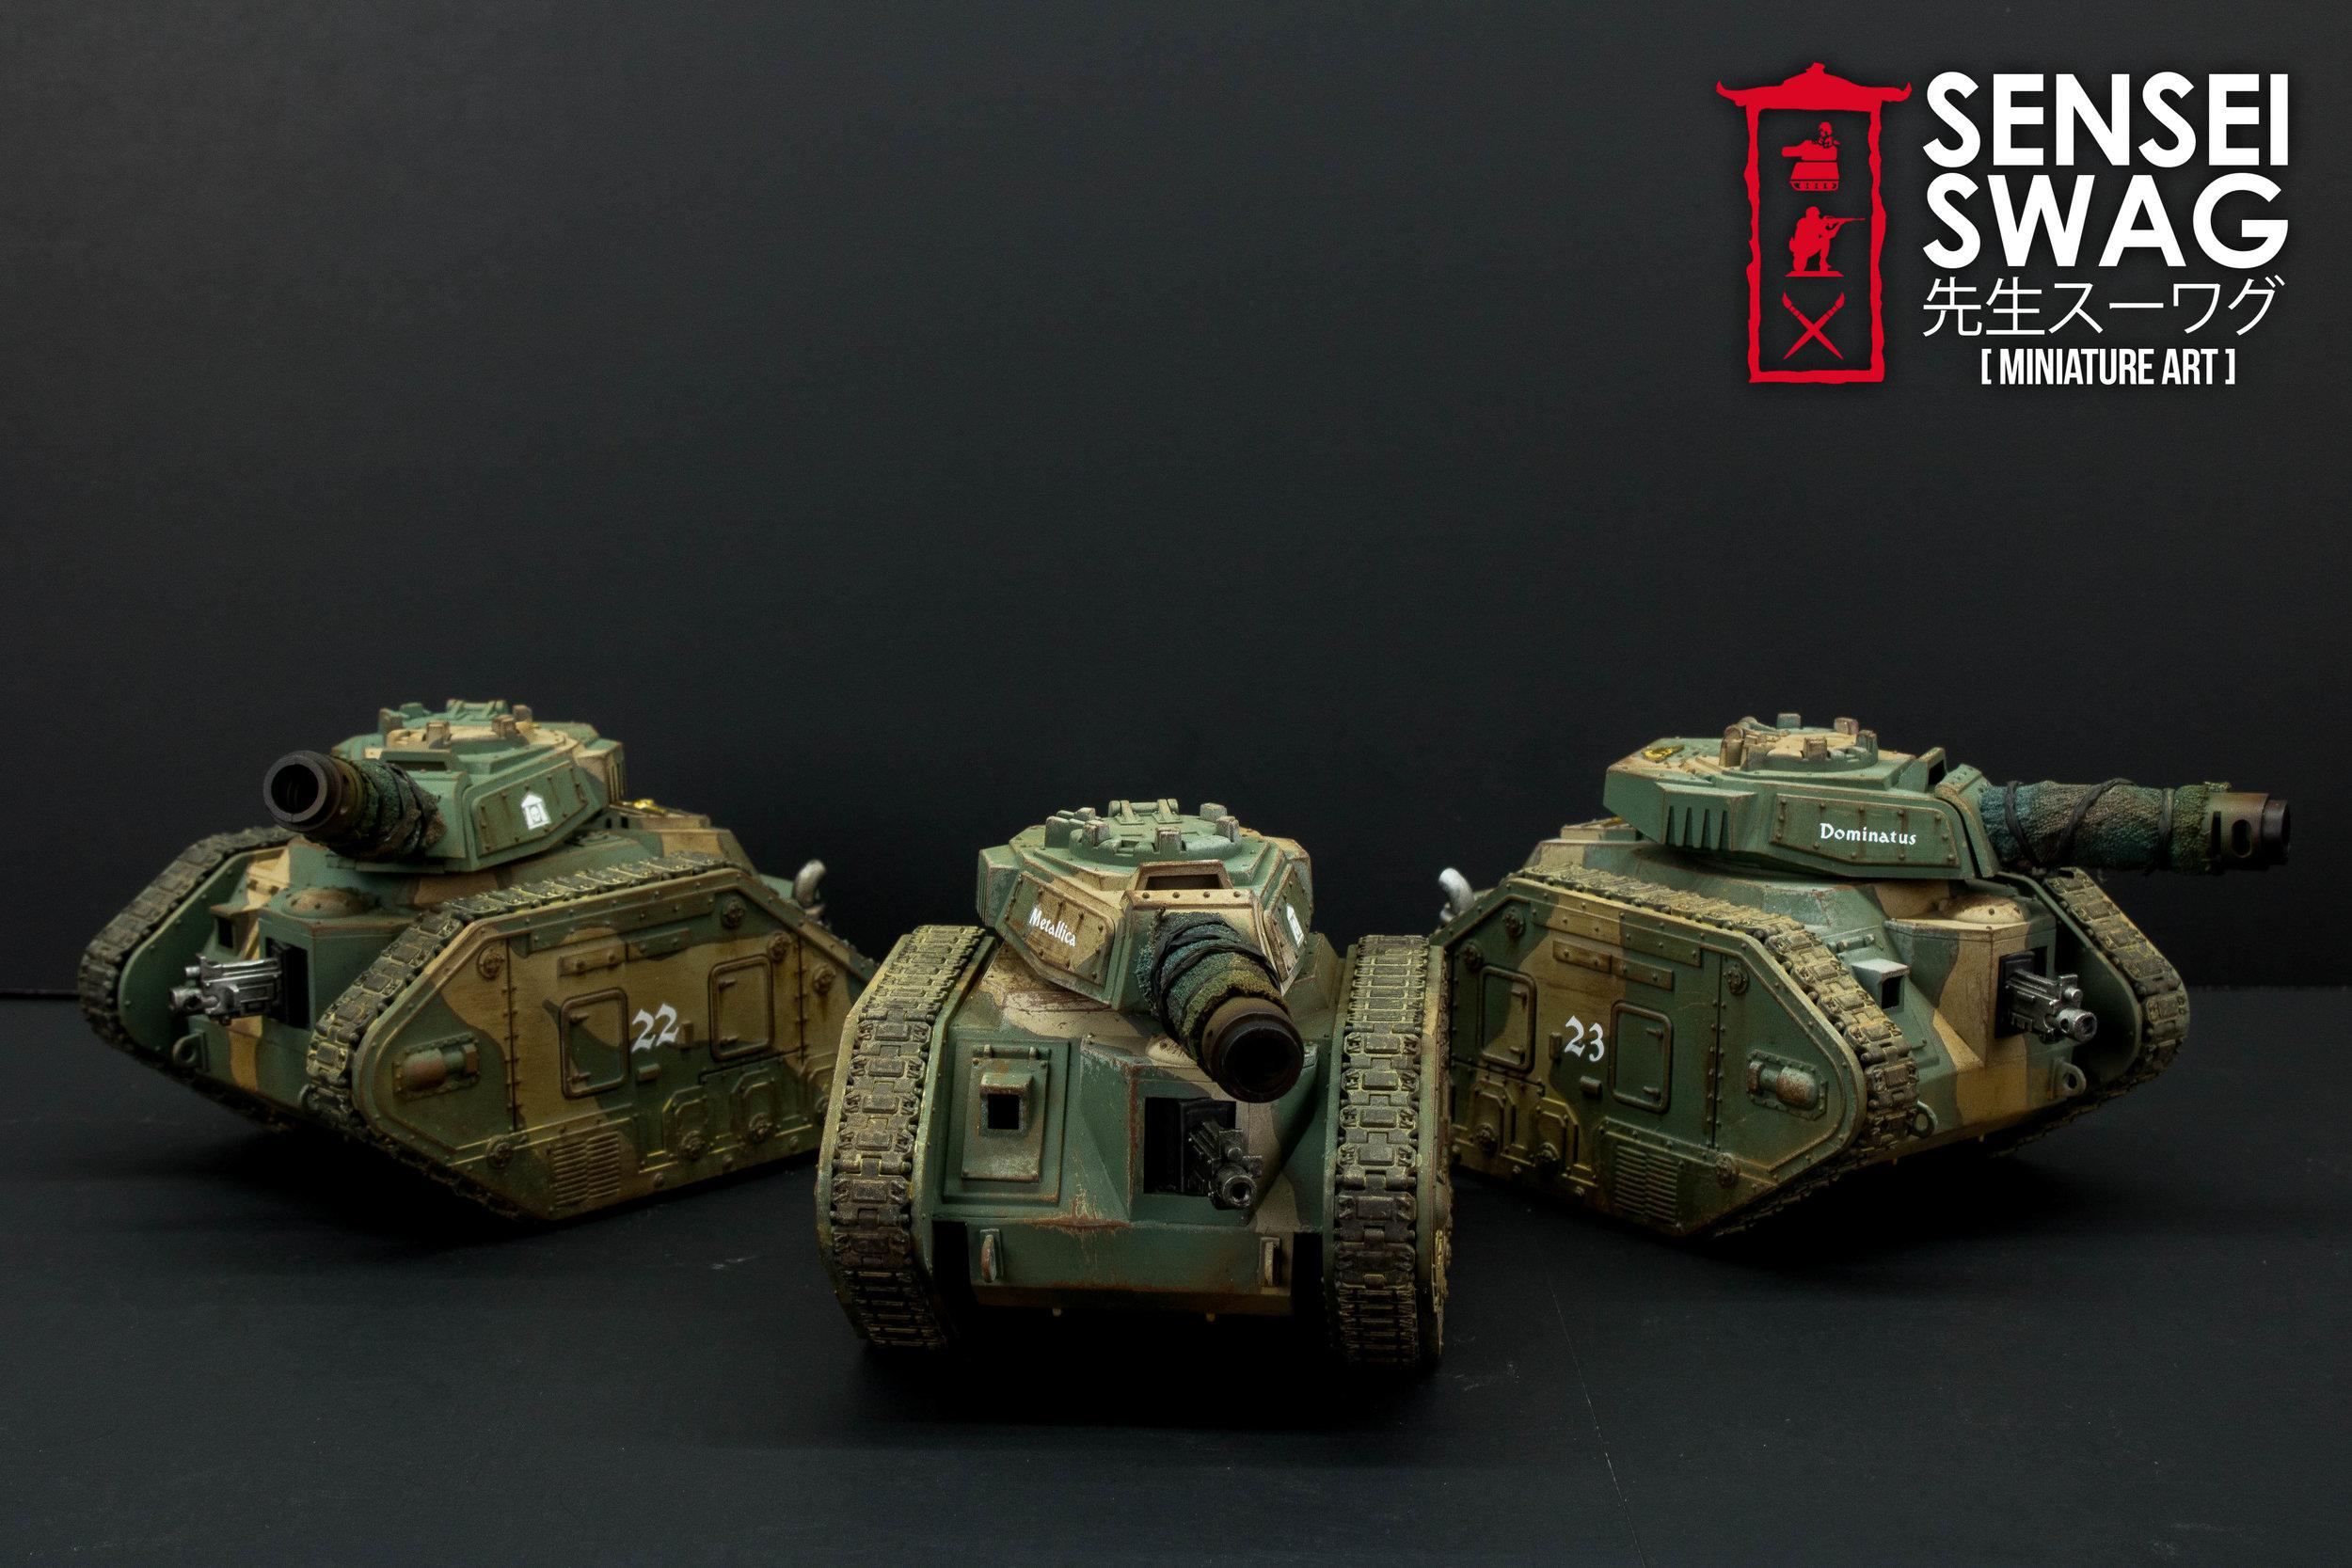 Cadian Armored Company Leman Russ 40k Tanks-4.jpg